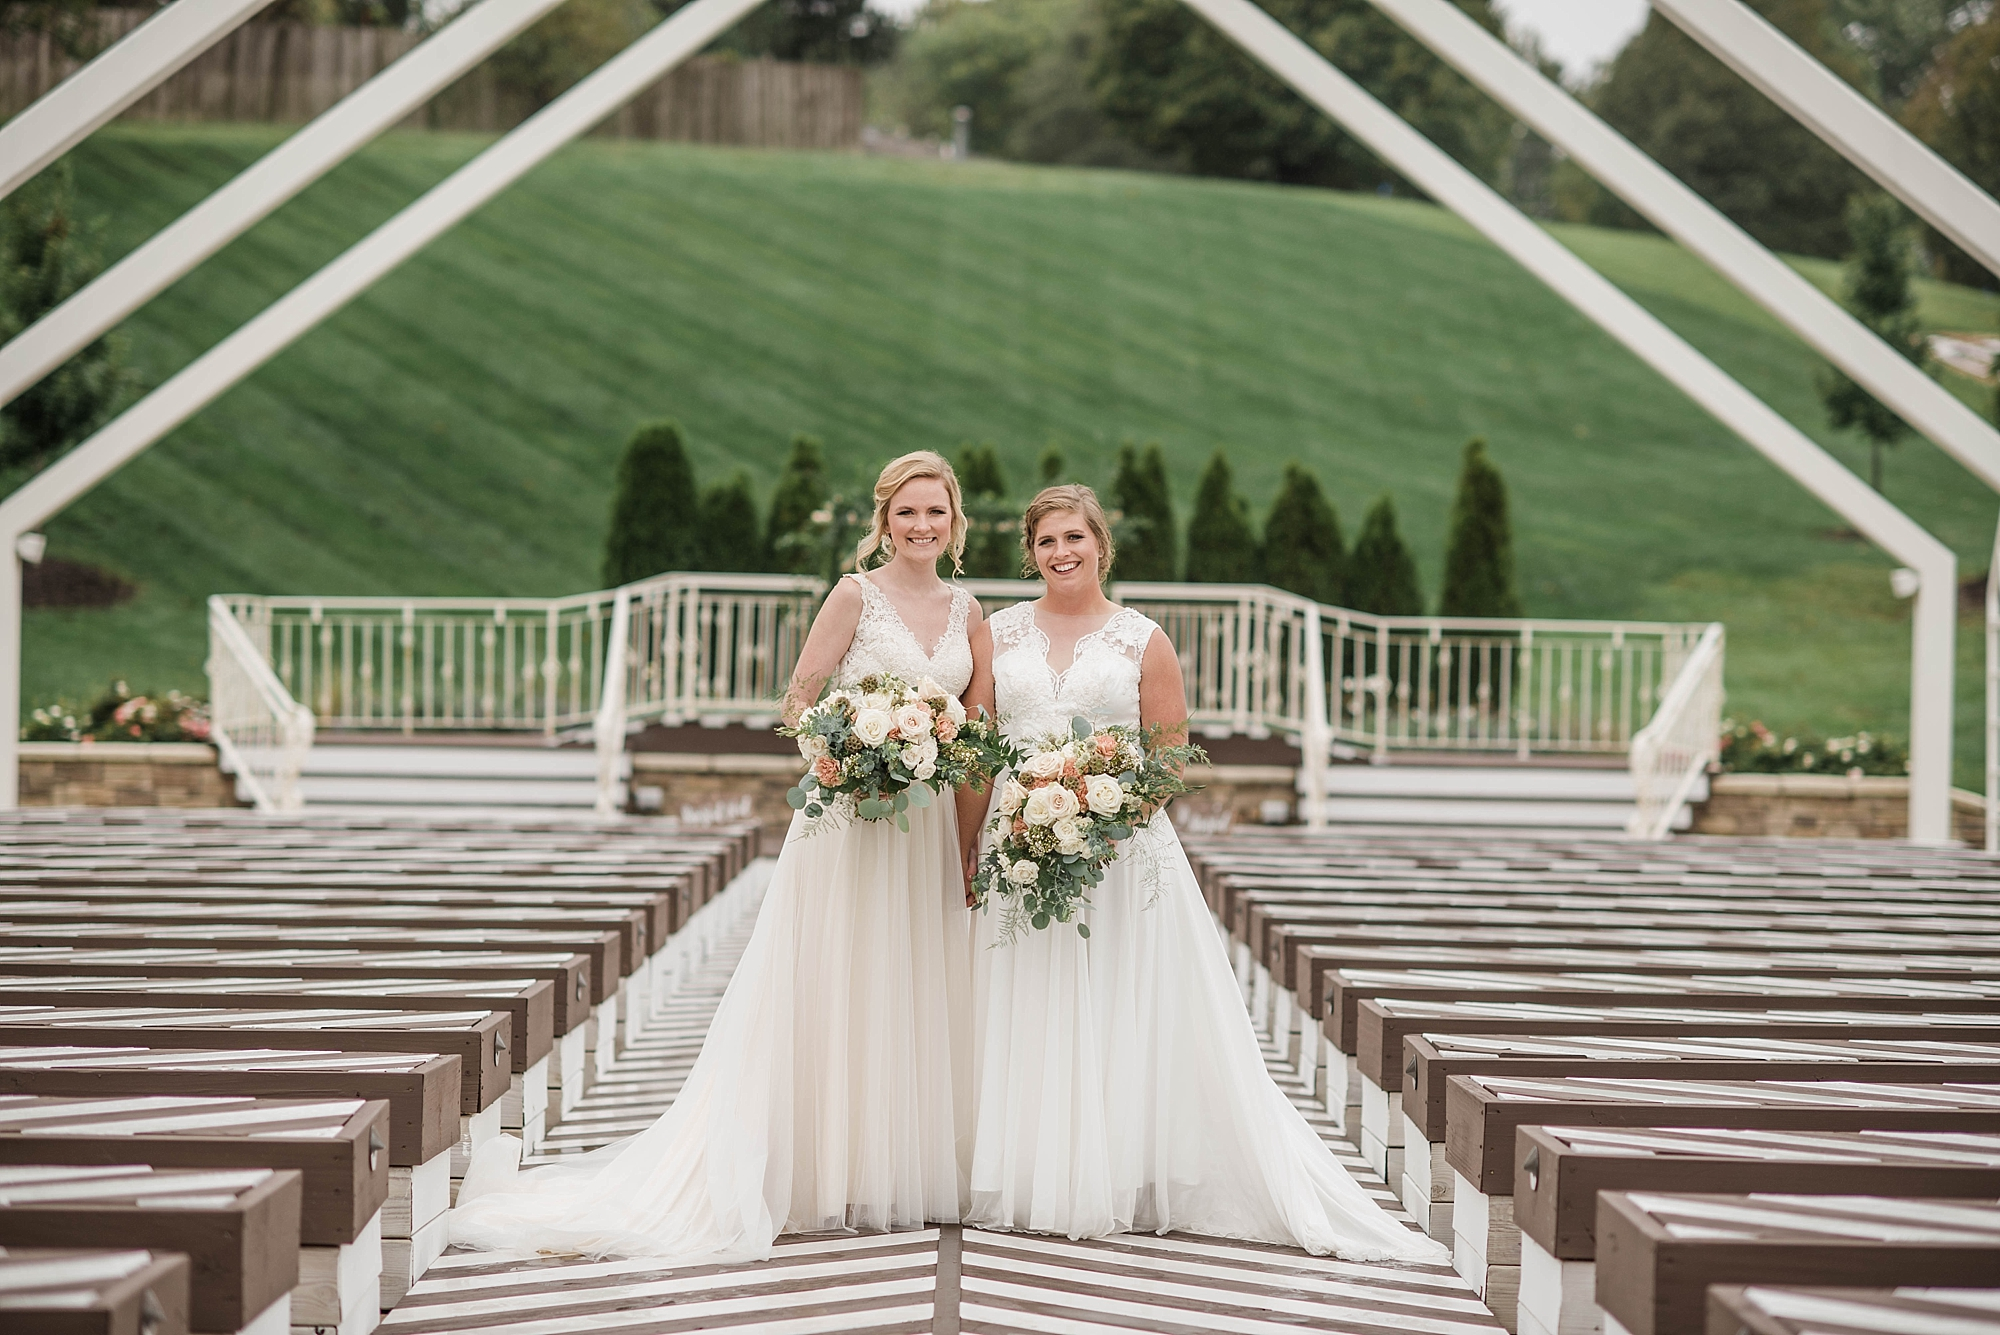 LGBTQ Wedding Photographer Kansas City - Pavilion Event Space - Kansas City Wedding Photographer